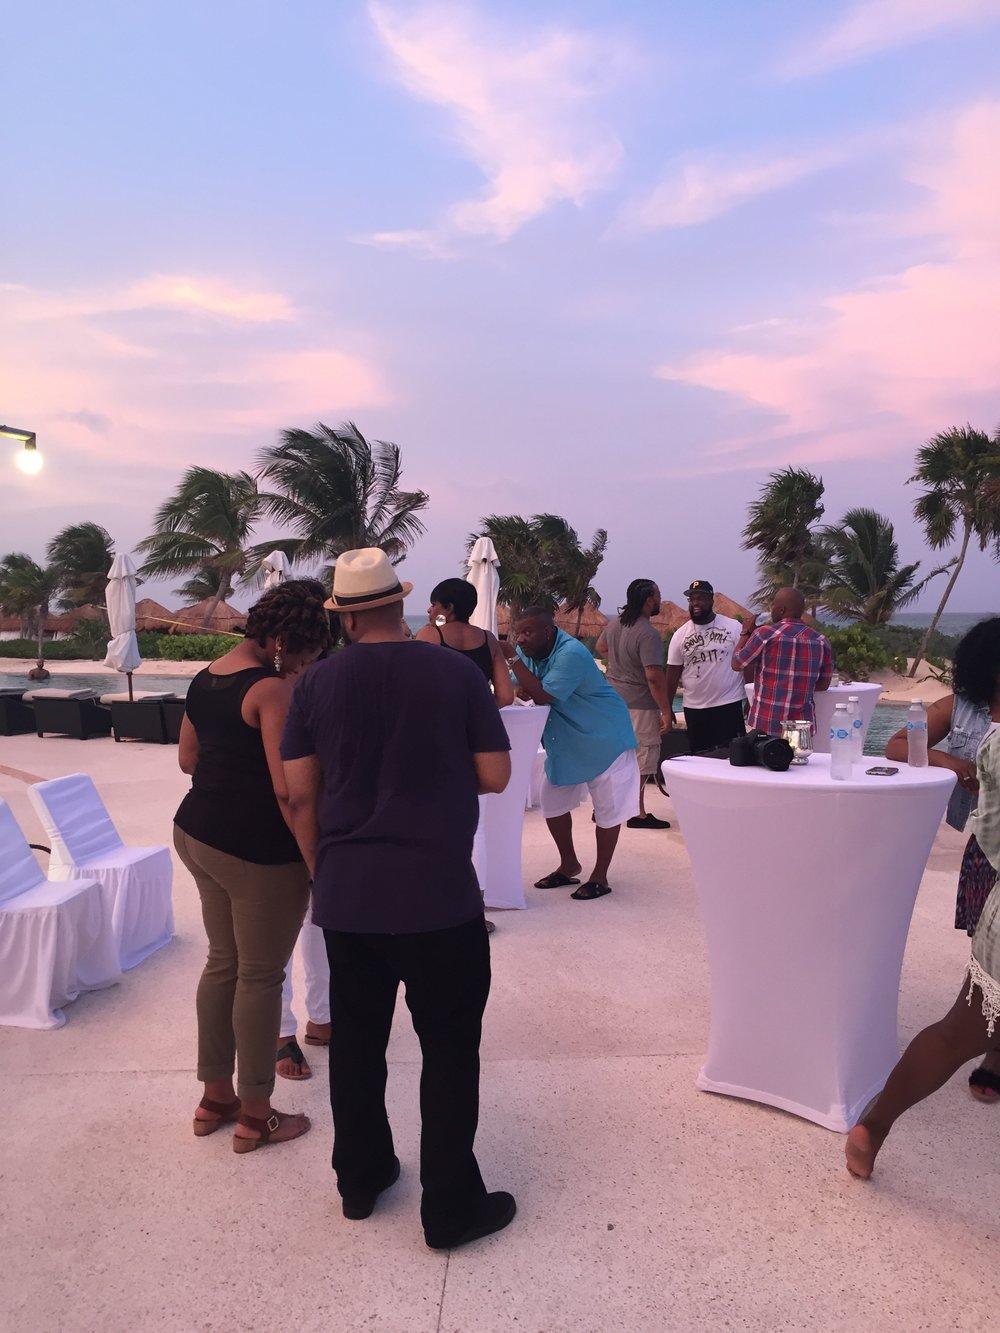 Black Destination Bride - BlackDesti Wedding Countdown Journal - Bridefriends Podcast - 3 Playa del Carmen Mexico - Secrets Maroma Welcome Pool5.JPG